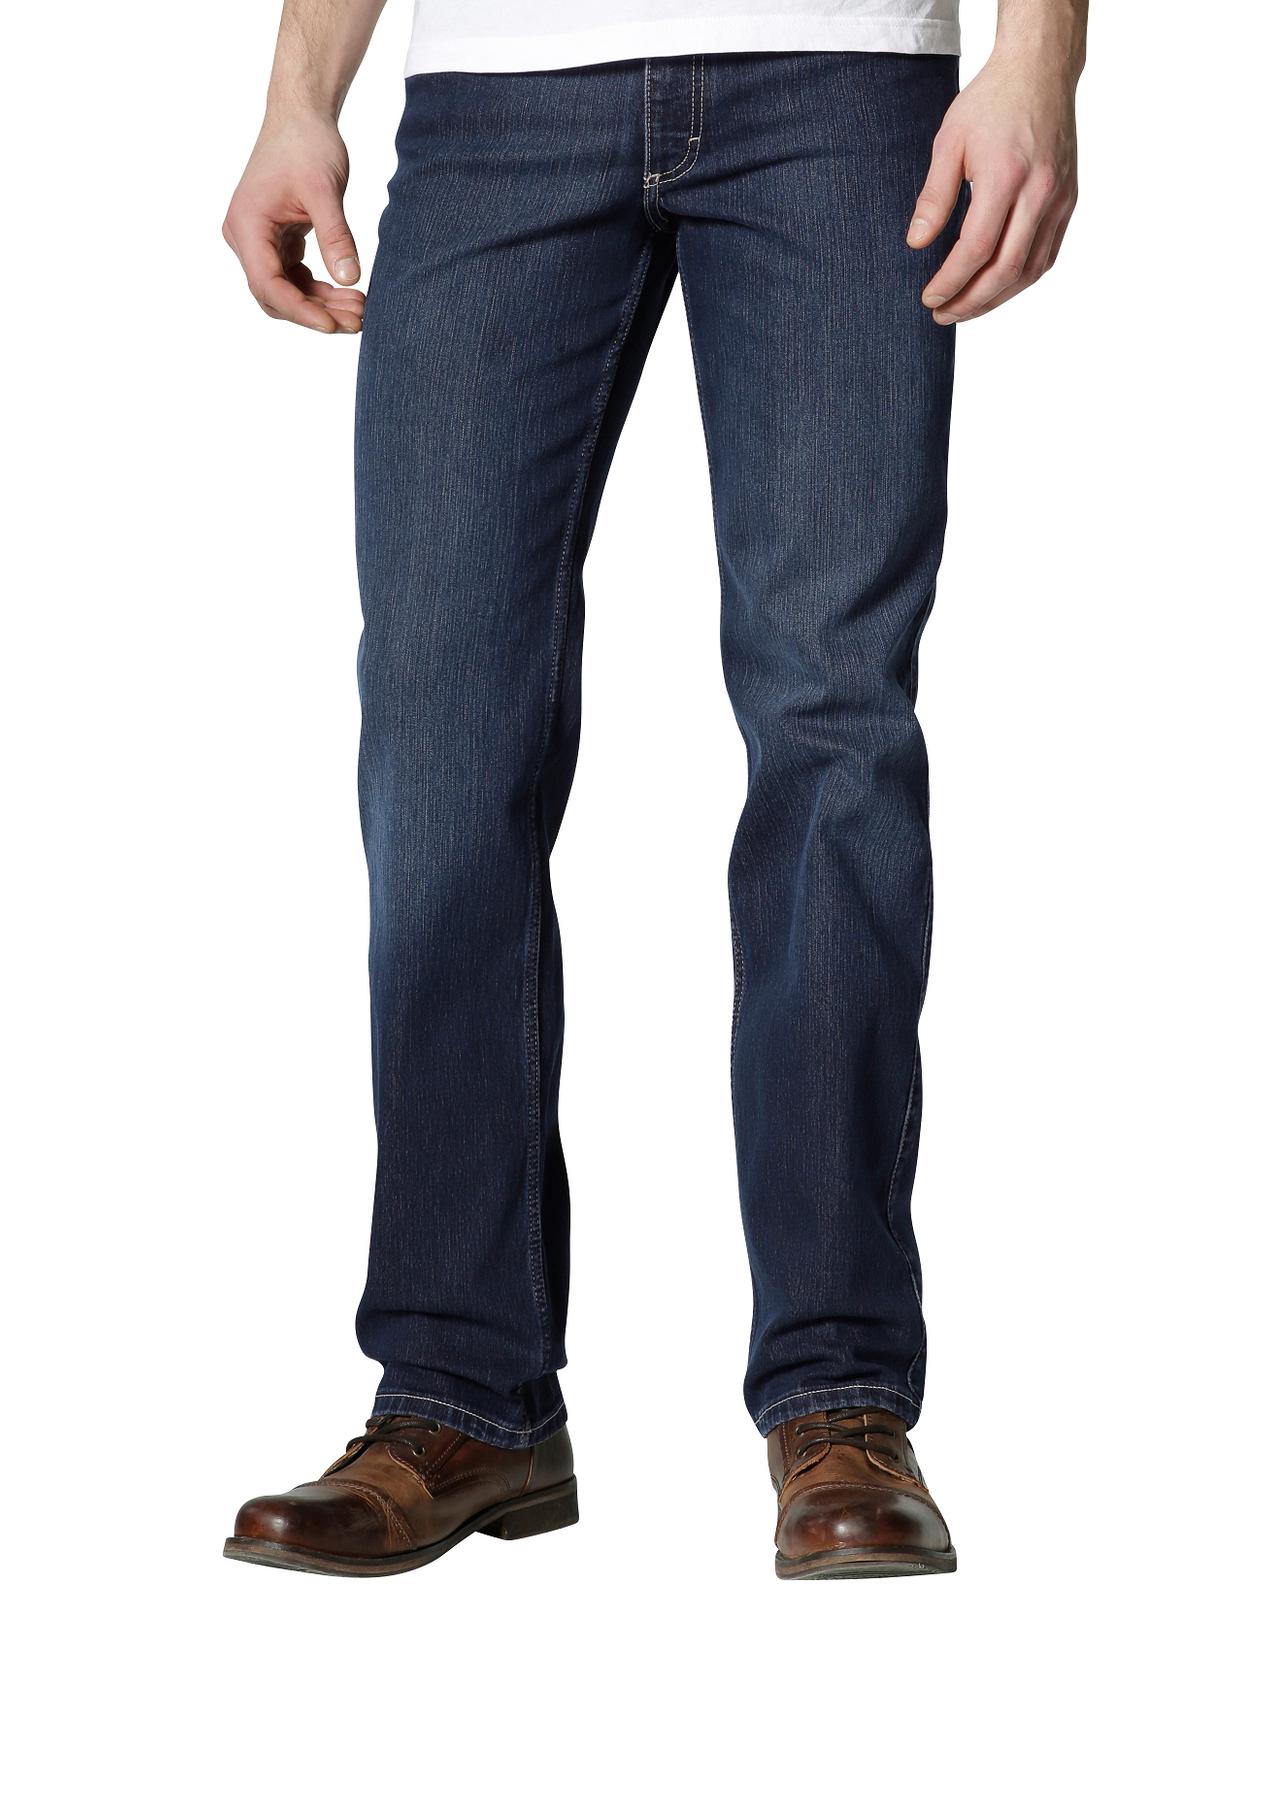 Mustang - Slim Fit - Herren 5-Pocket Jeans in Farben stone washed, vintage used und old stone unsed, Tramper (111-5126)